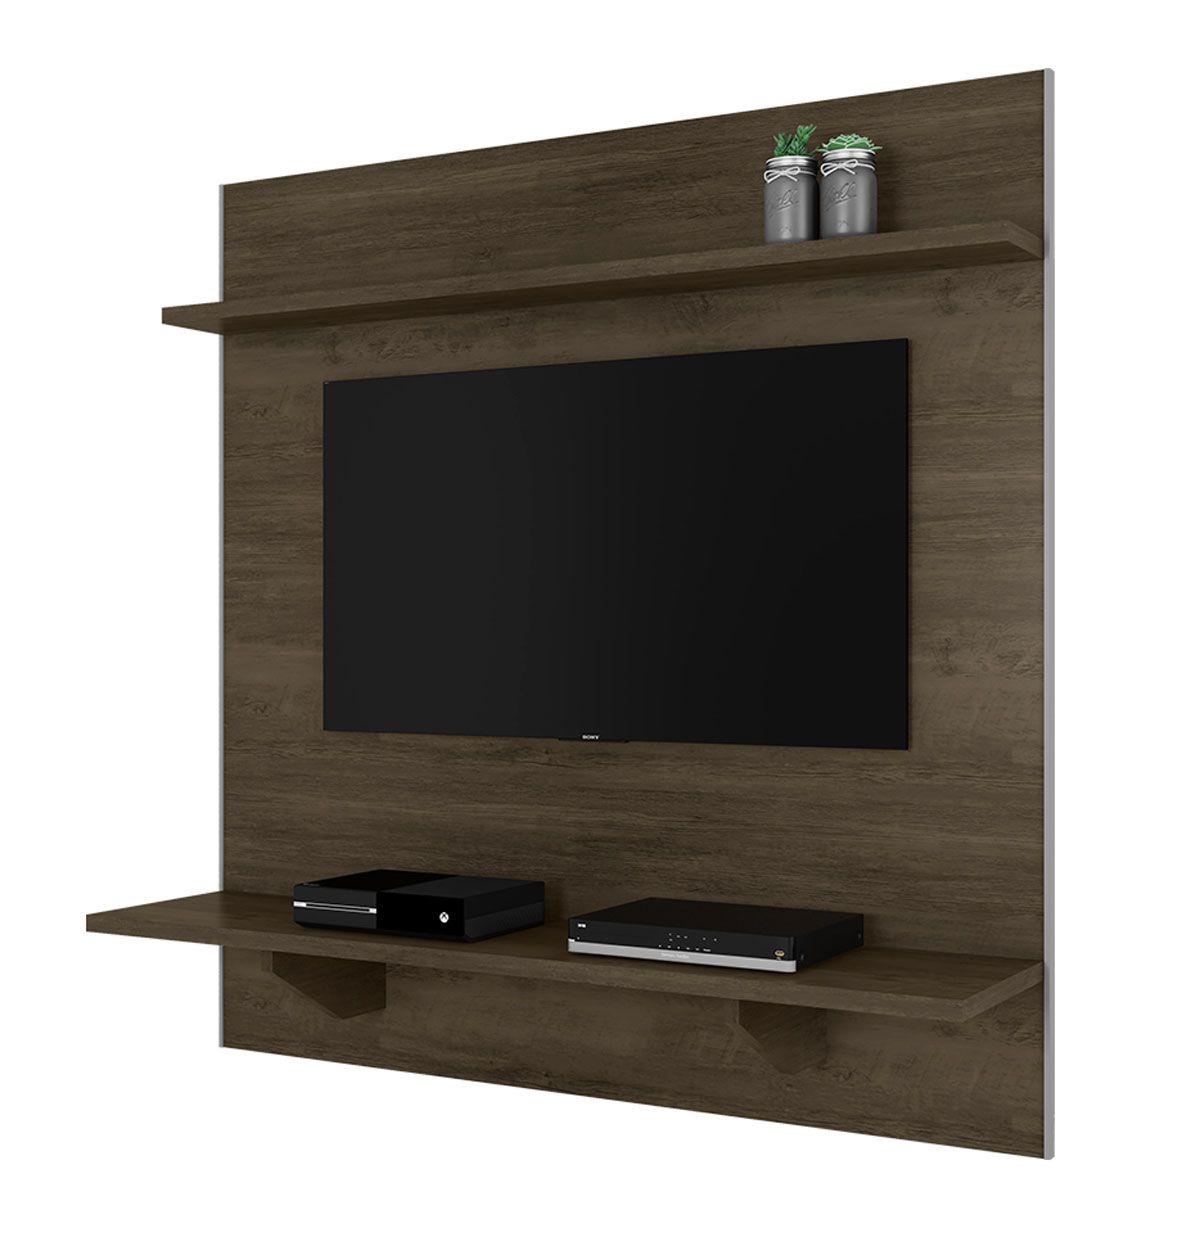 Painel para TV Monaco Noce - RV Móveis